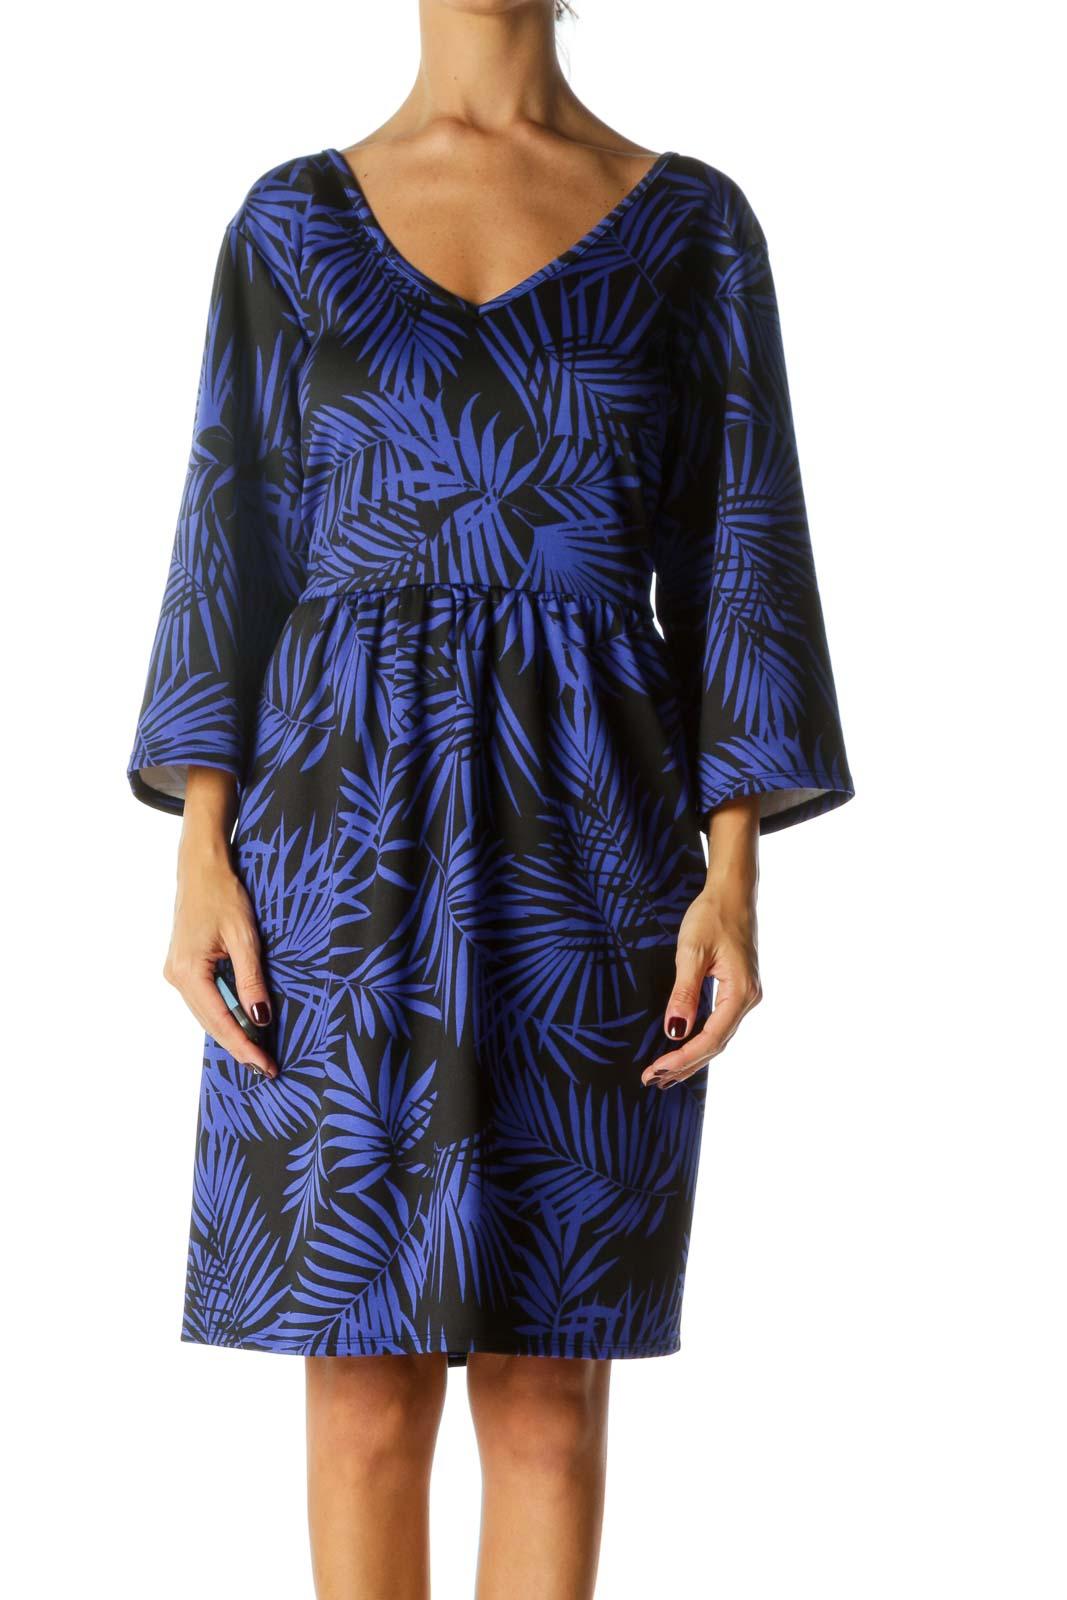 Black Blue Palm Leaves Print 3/4 Sleeve Pocketed Dress Front